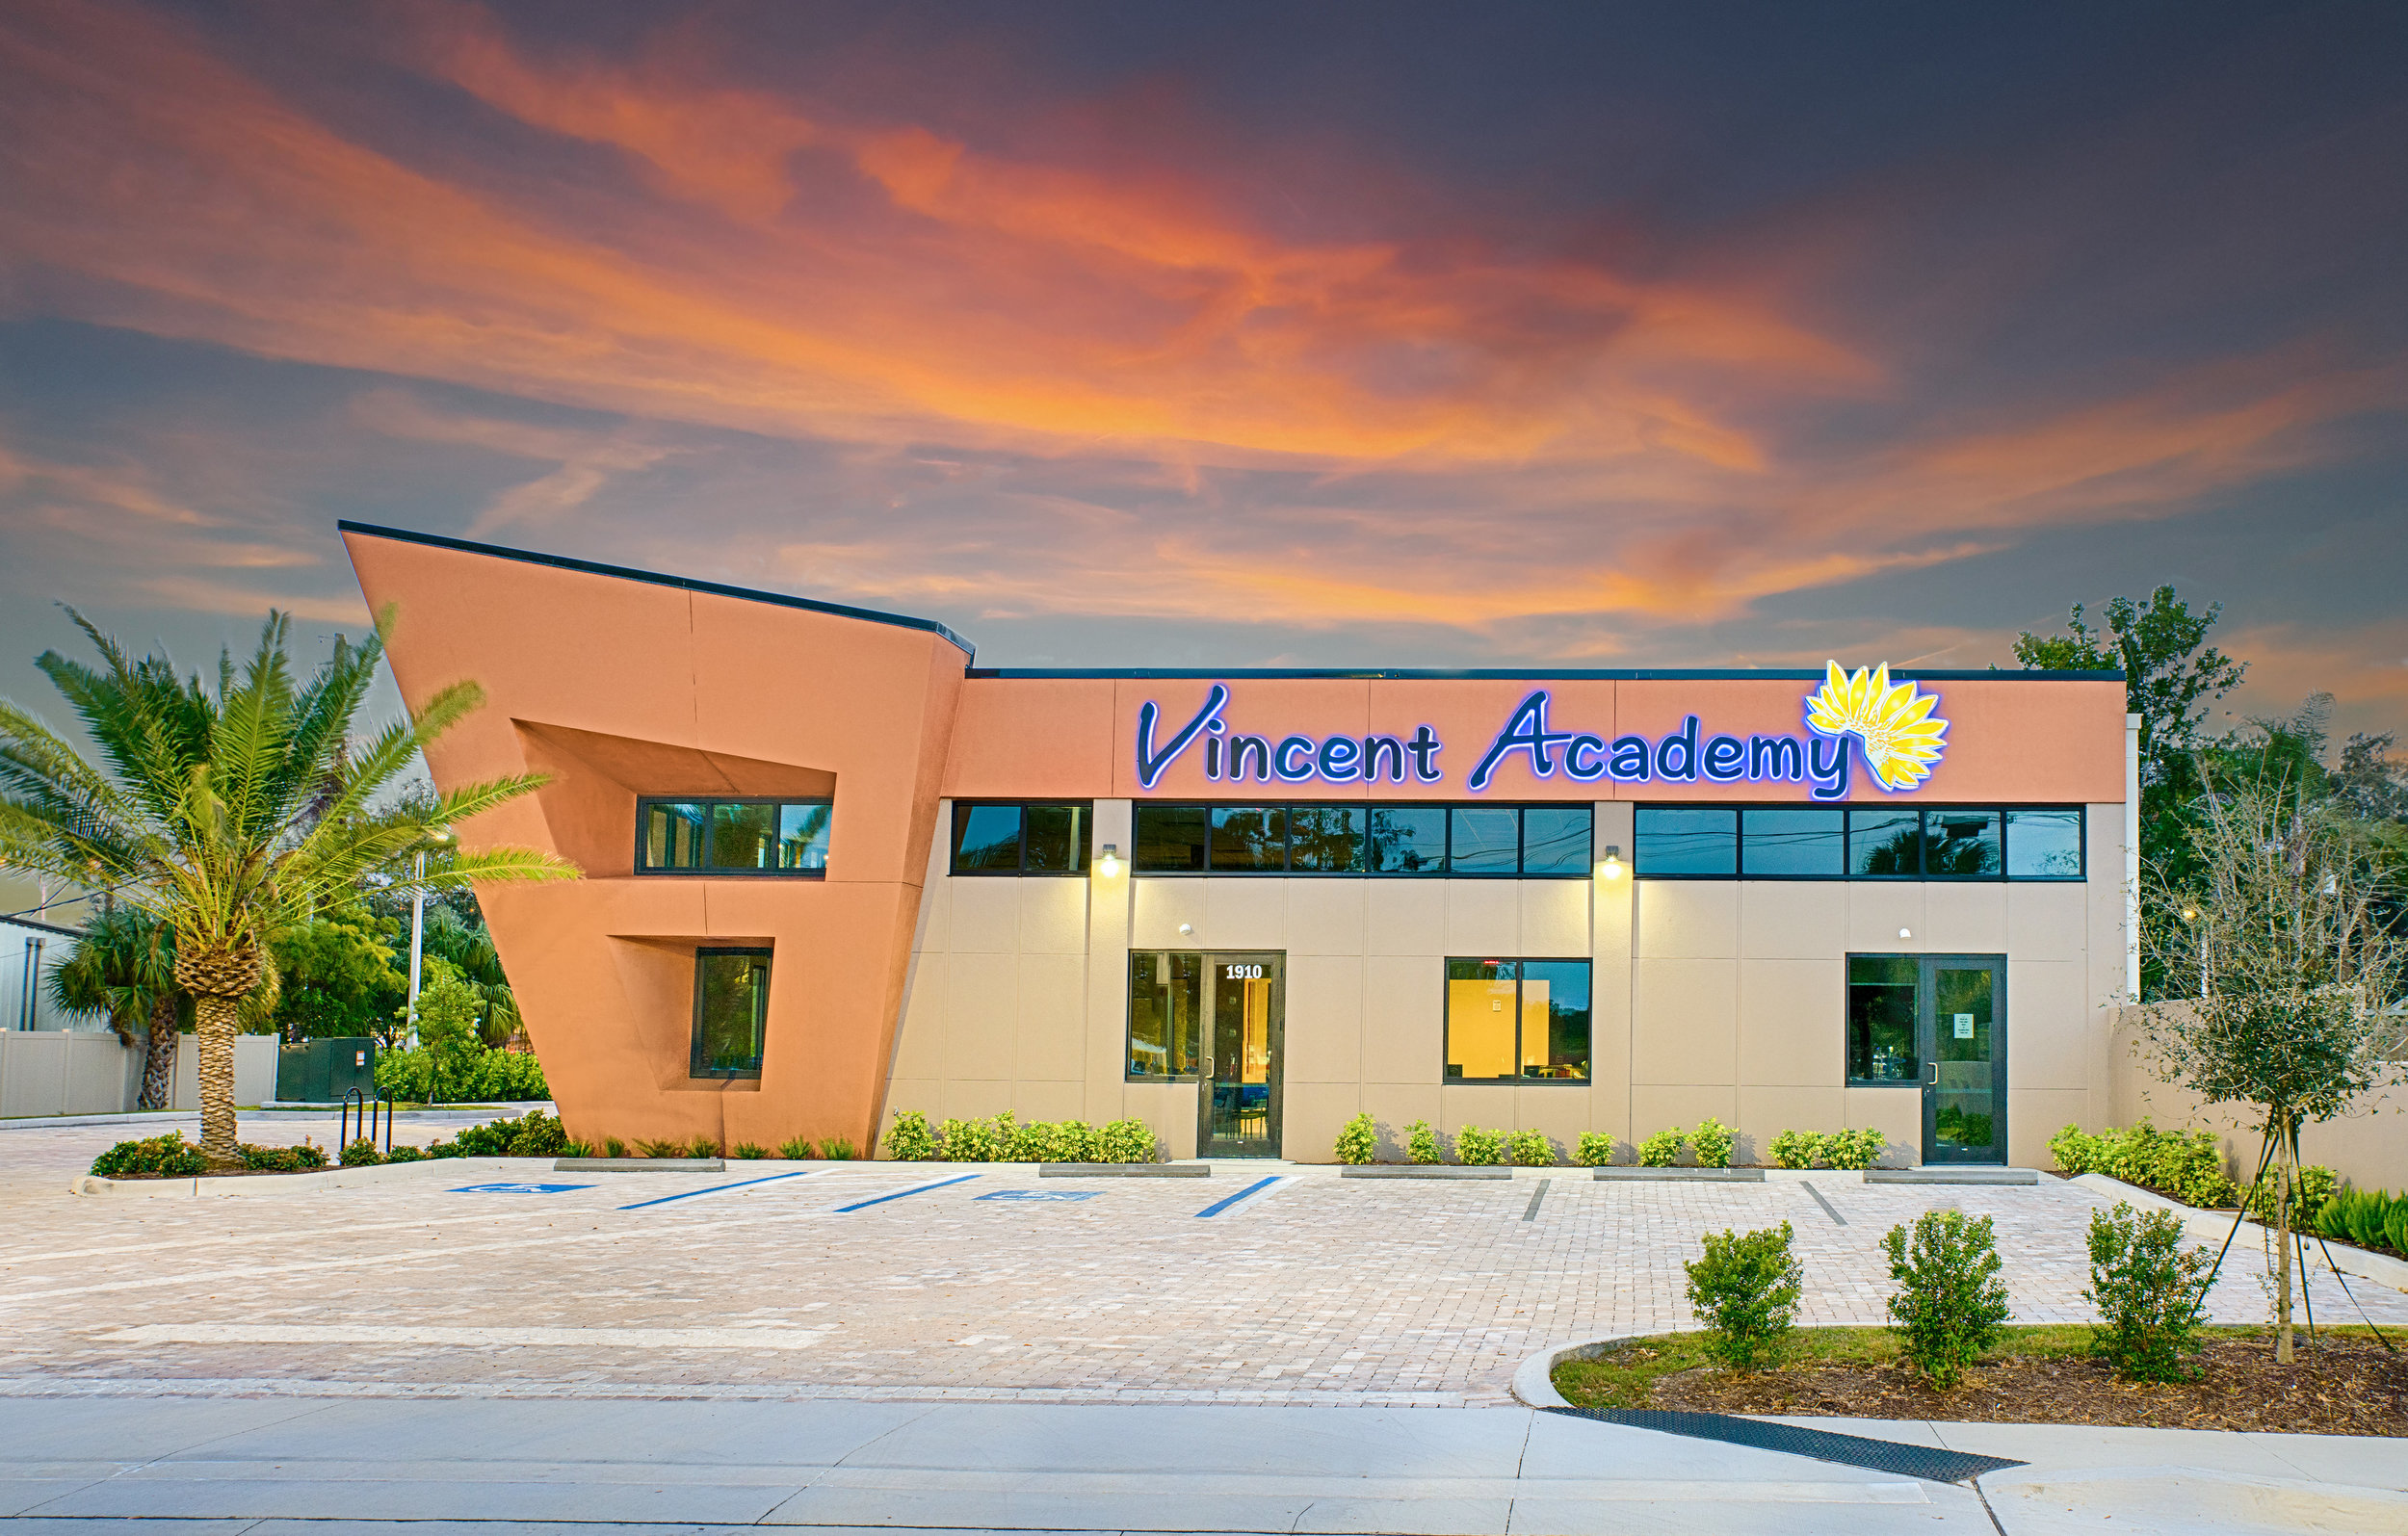 Vincent_Academy_01.jpg